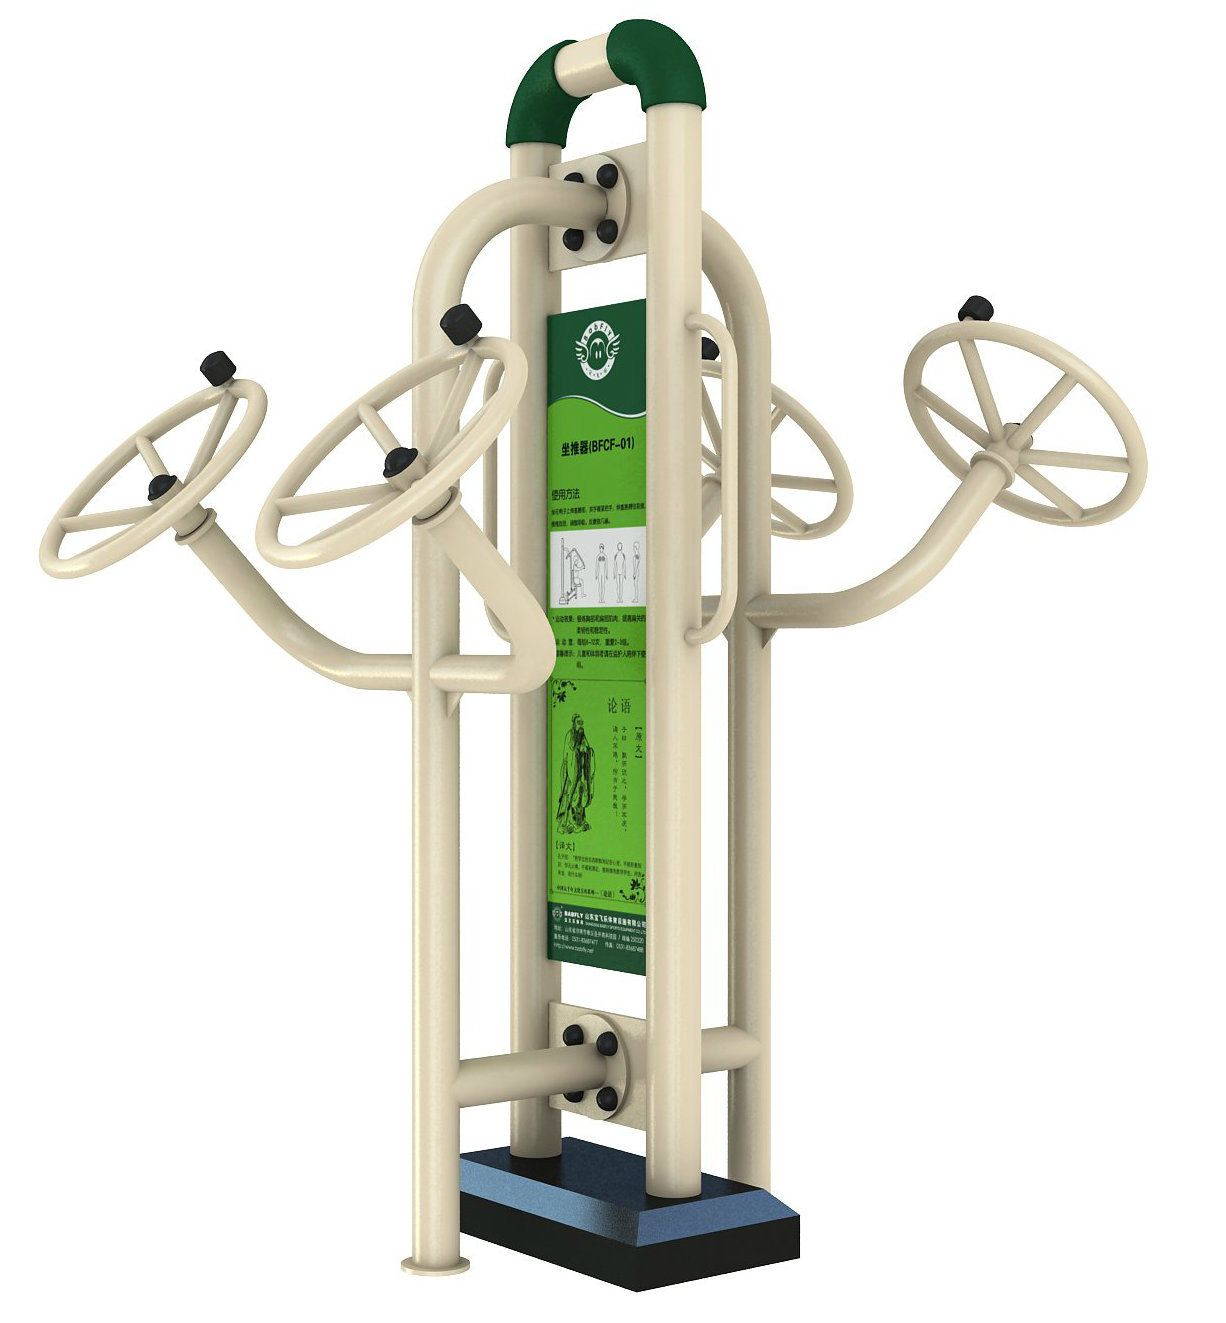 Arm Wheels Outdoor Gym Equipment